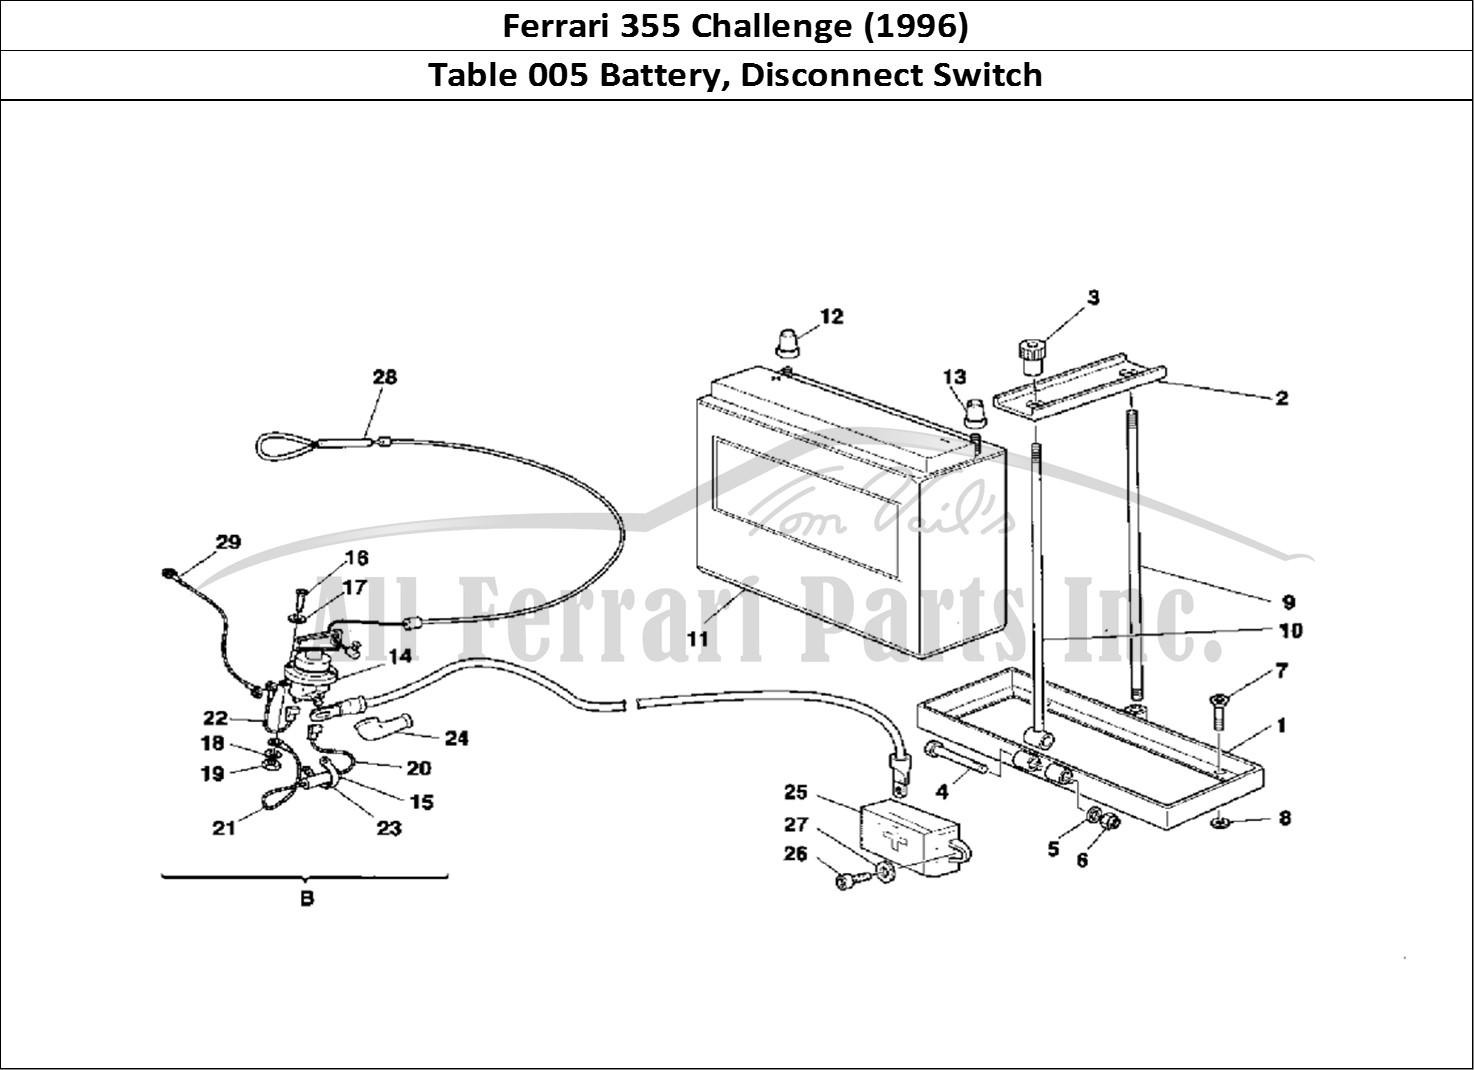 Buy Original Ferrari 355 Challenge 005 Battery